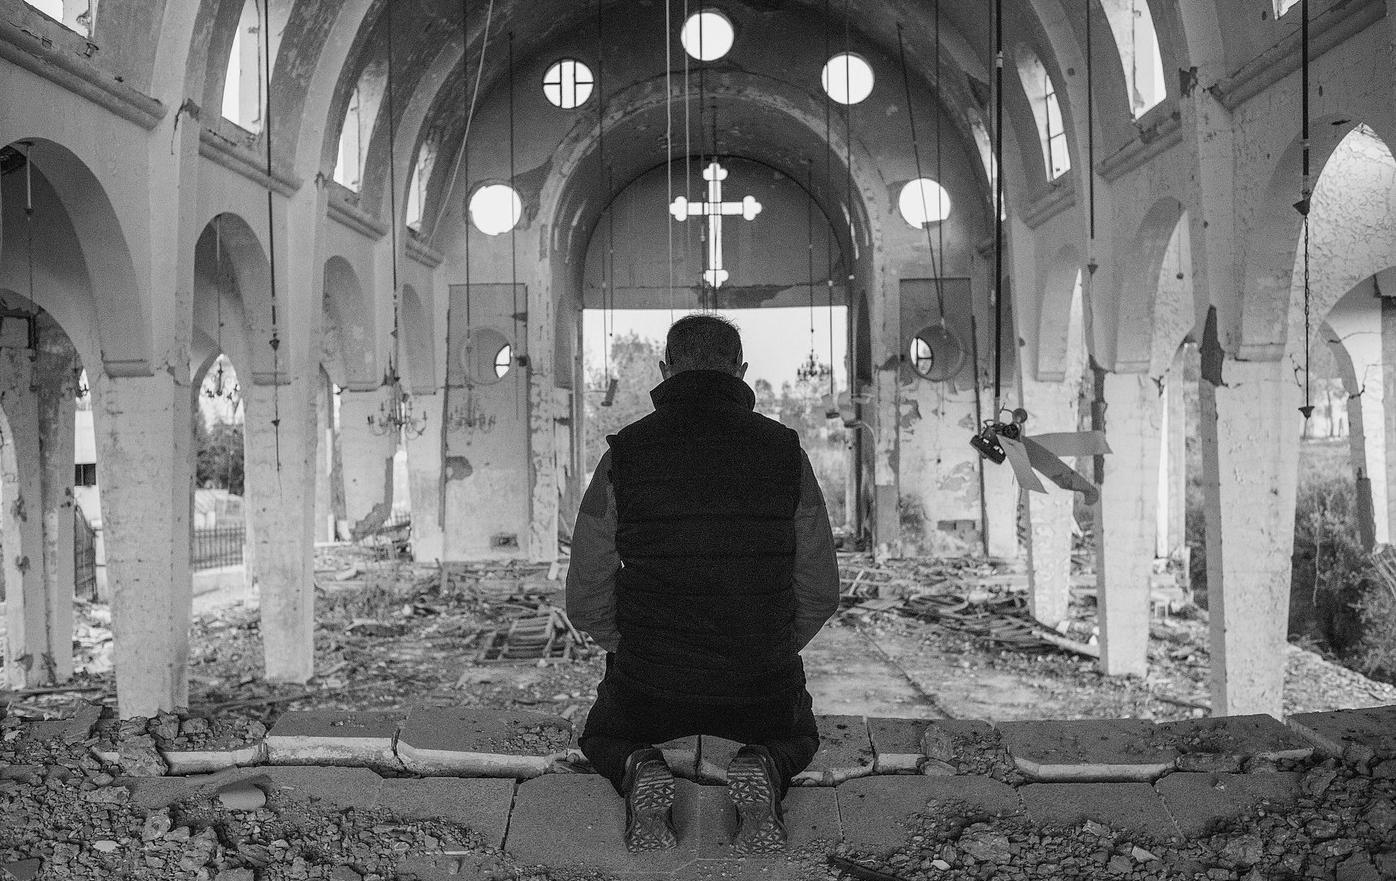 Eglise detruite daech nb